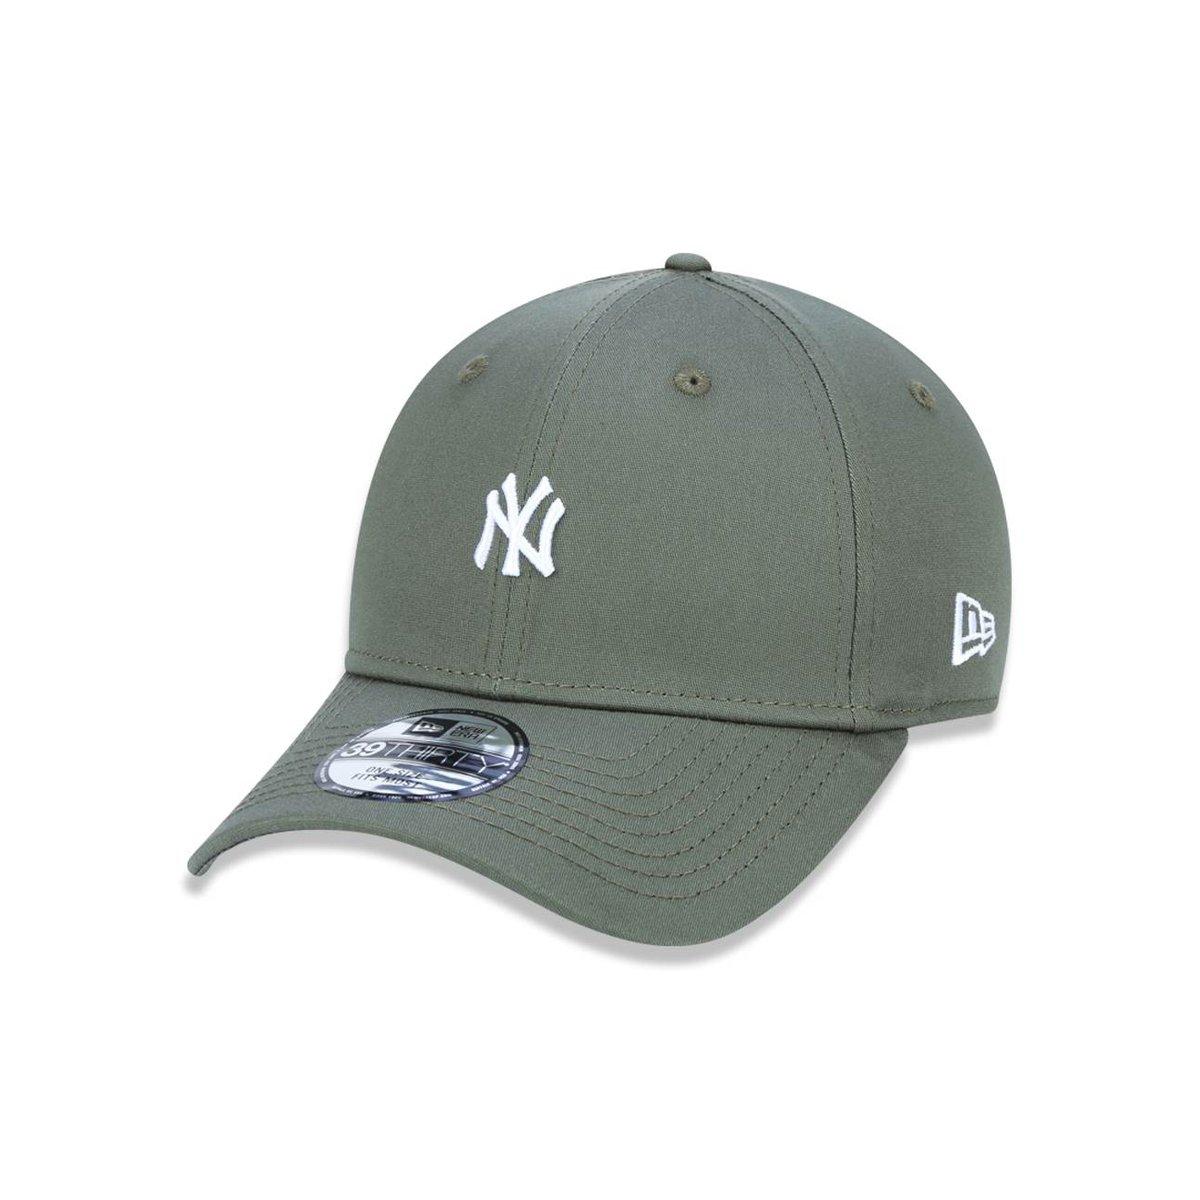 Boné 3930 New York Yankees MLB Aba Curva New Era - Compre Agora ... 37e32b7135e4e